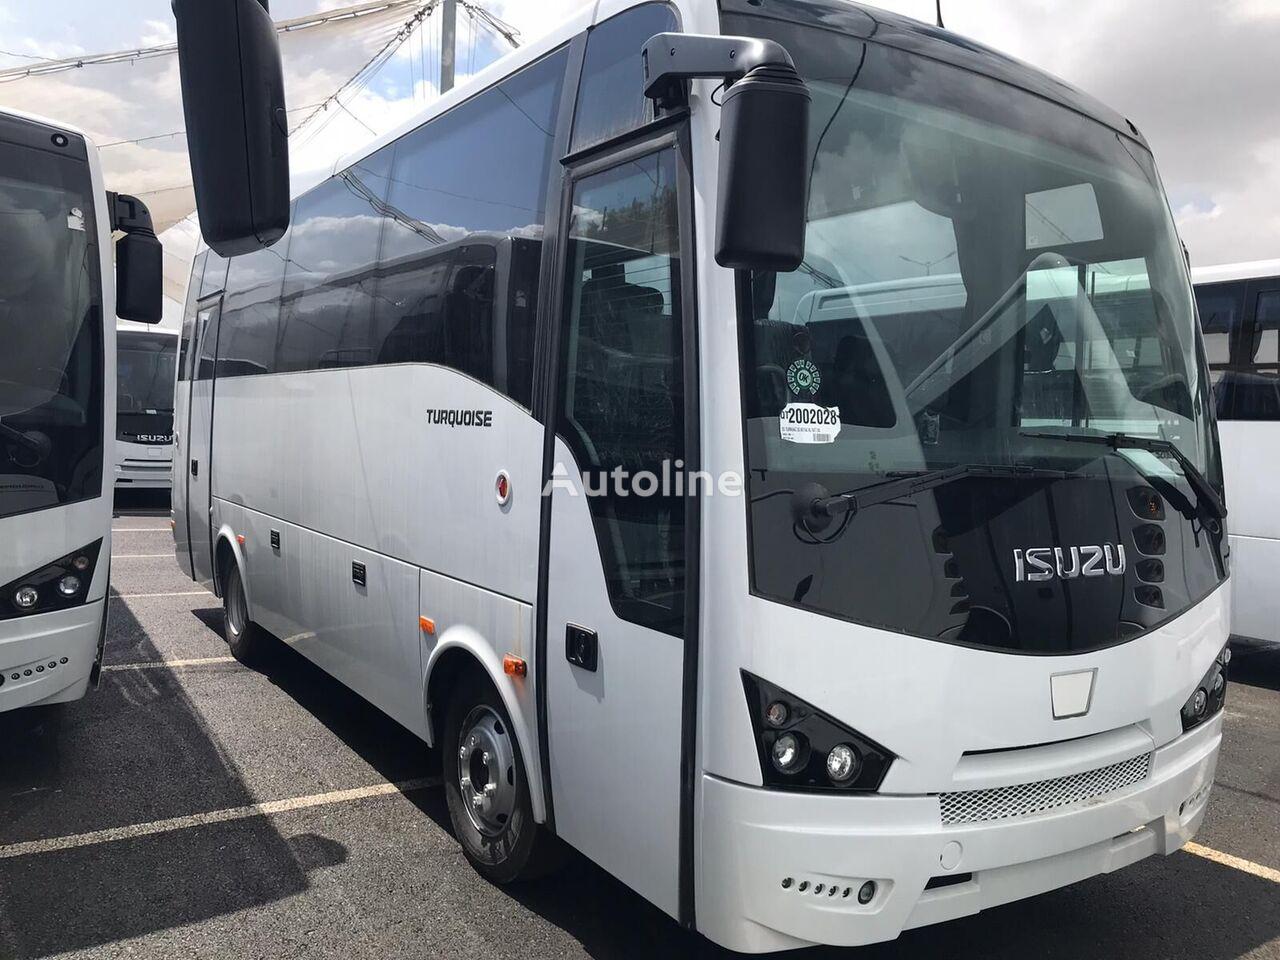 new ISUZU Turquoise 3 x Stock  Euro 5 ! we ship worldwide !! coach bus